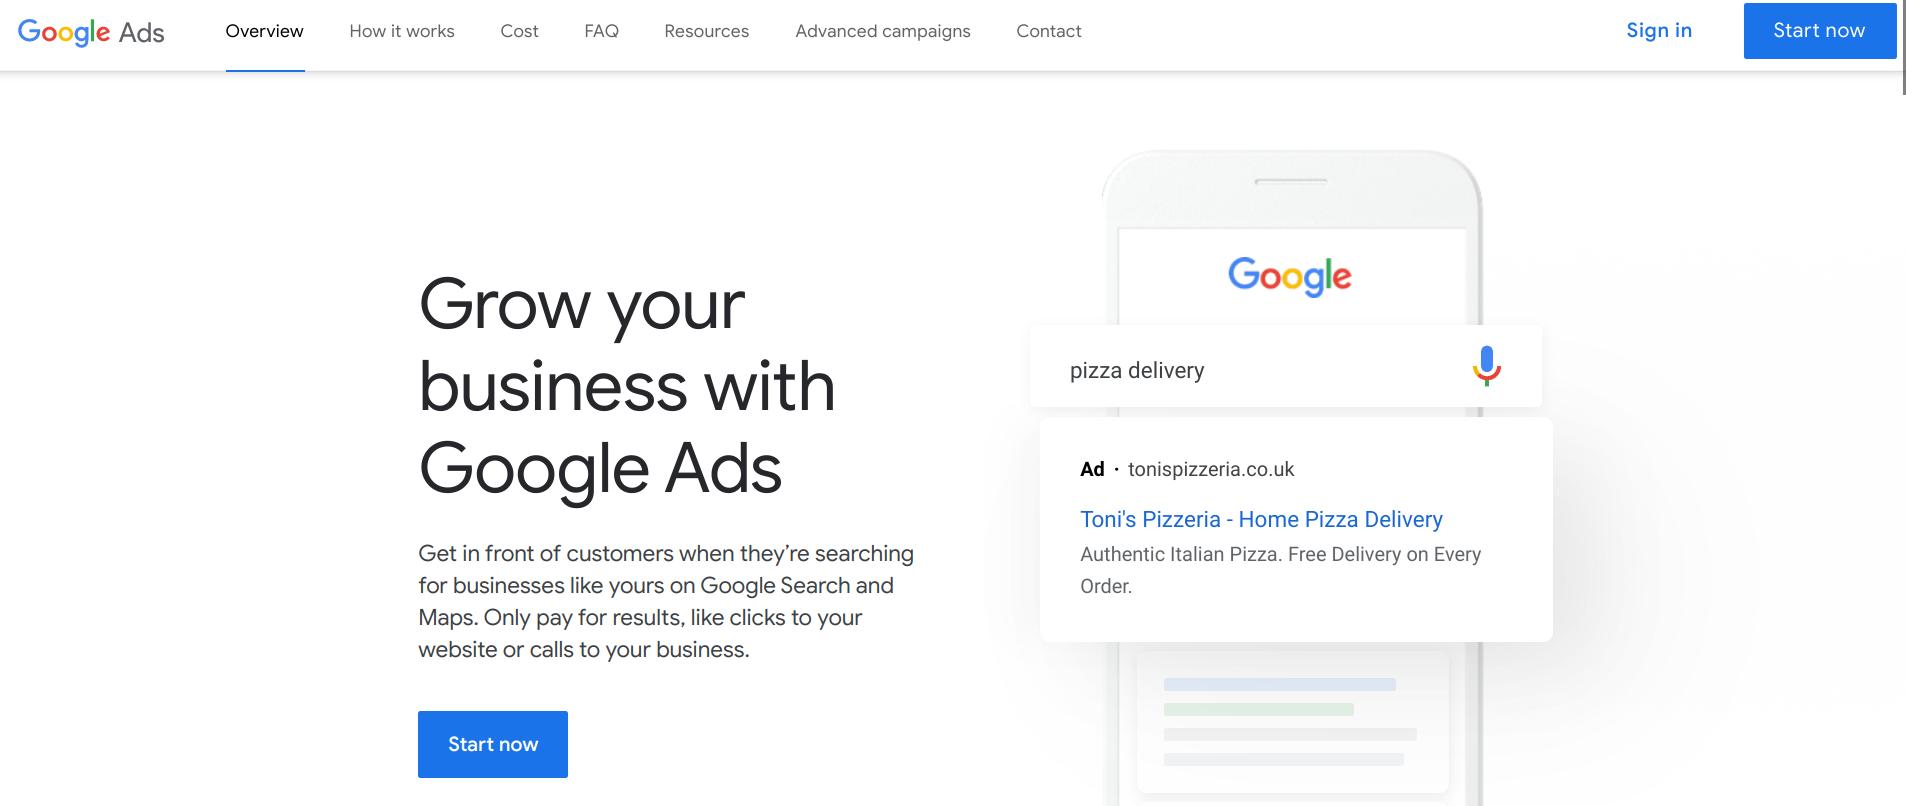 Google Ads Image 2